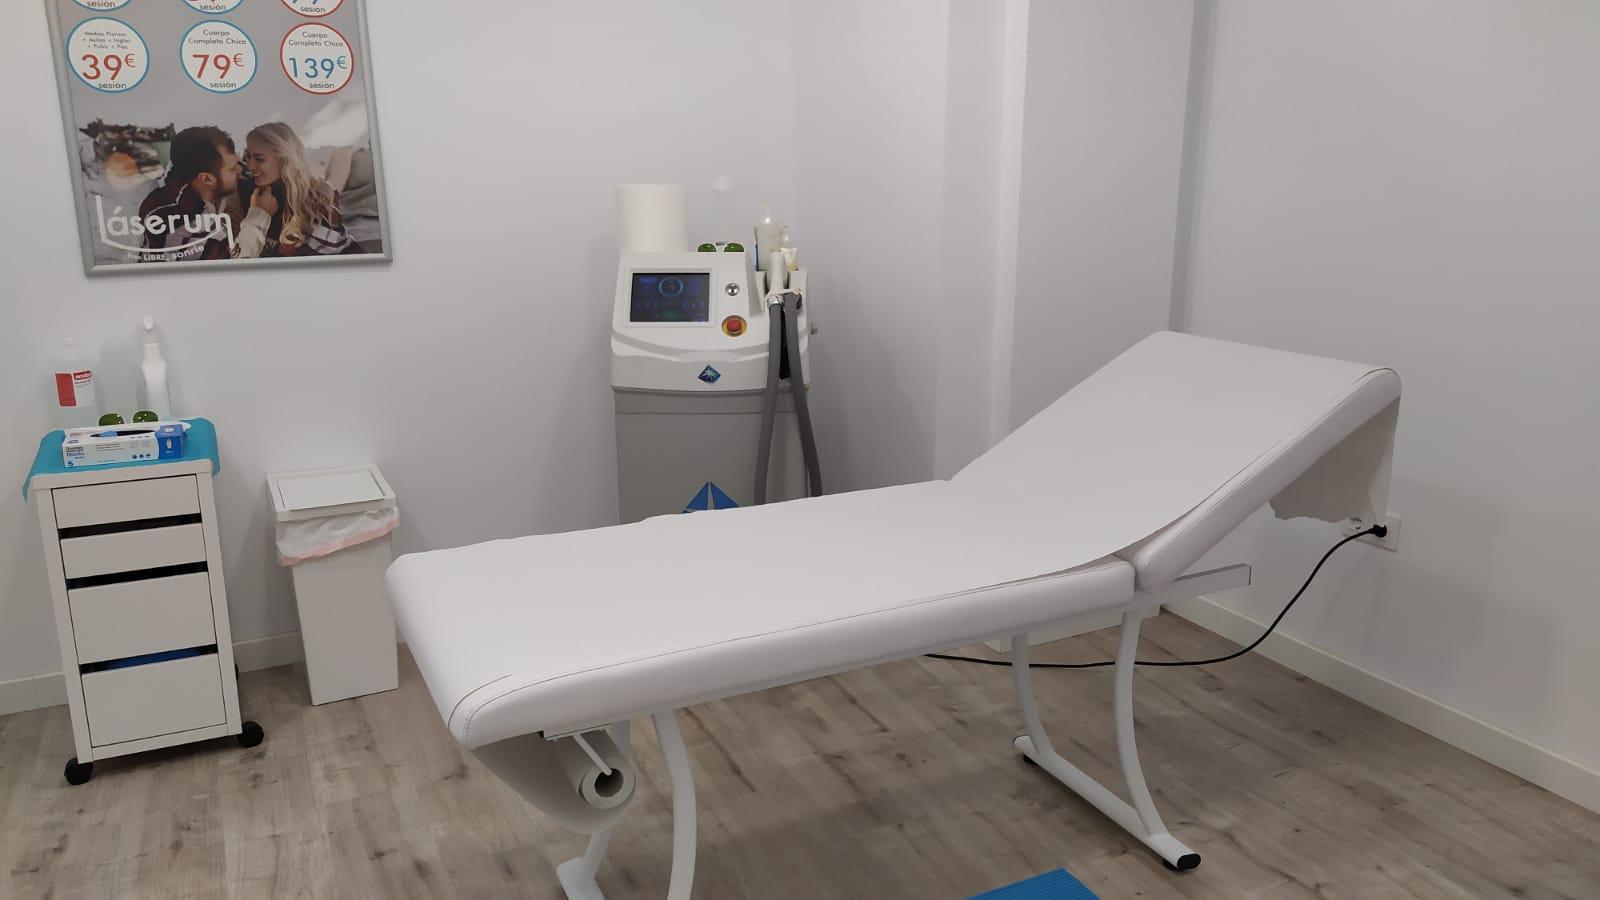 centro depilacion laser diodo caceres